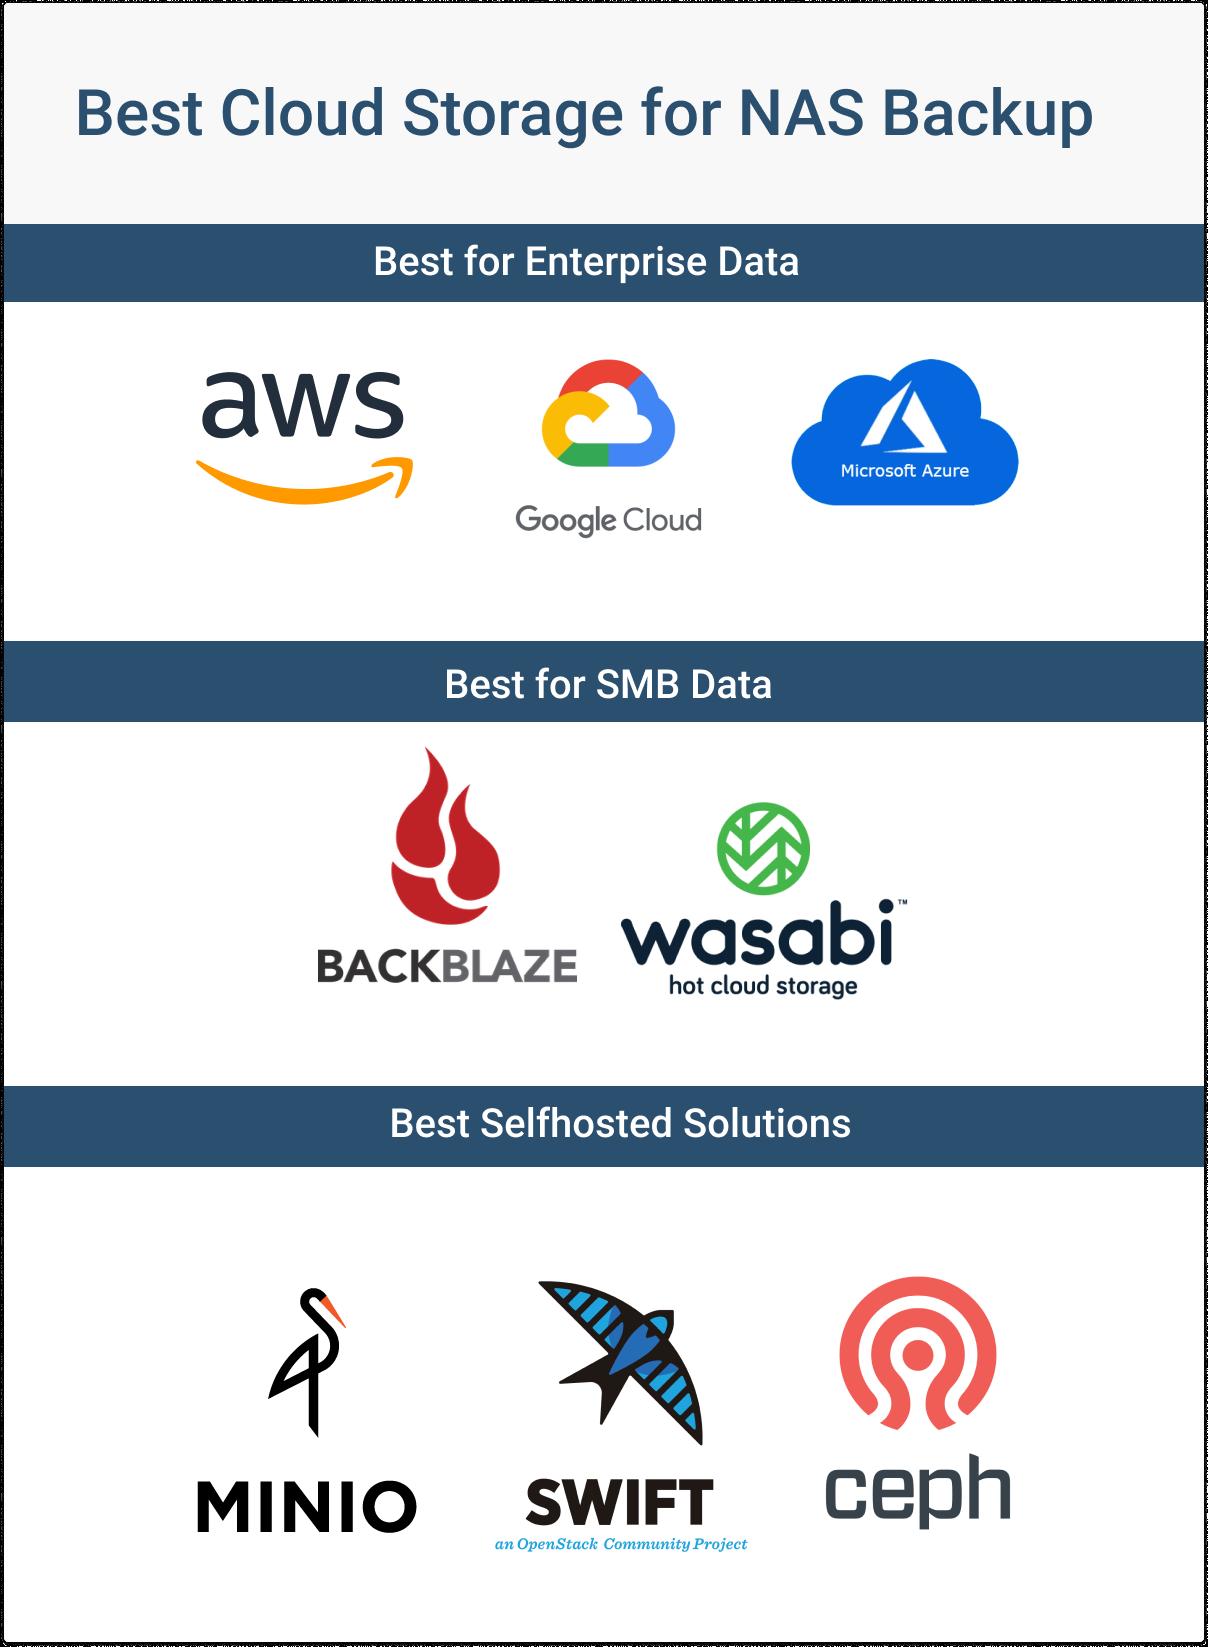 Best Cloud Storage Solutions for NAS Backups